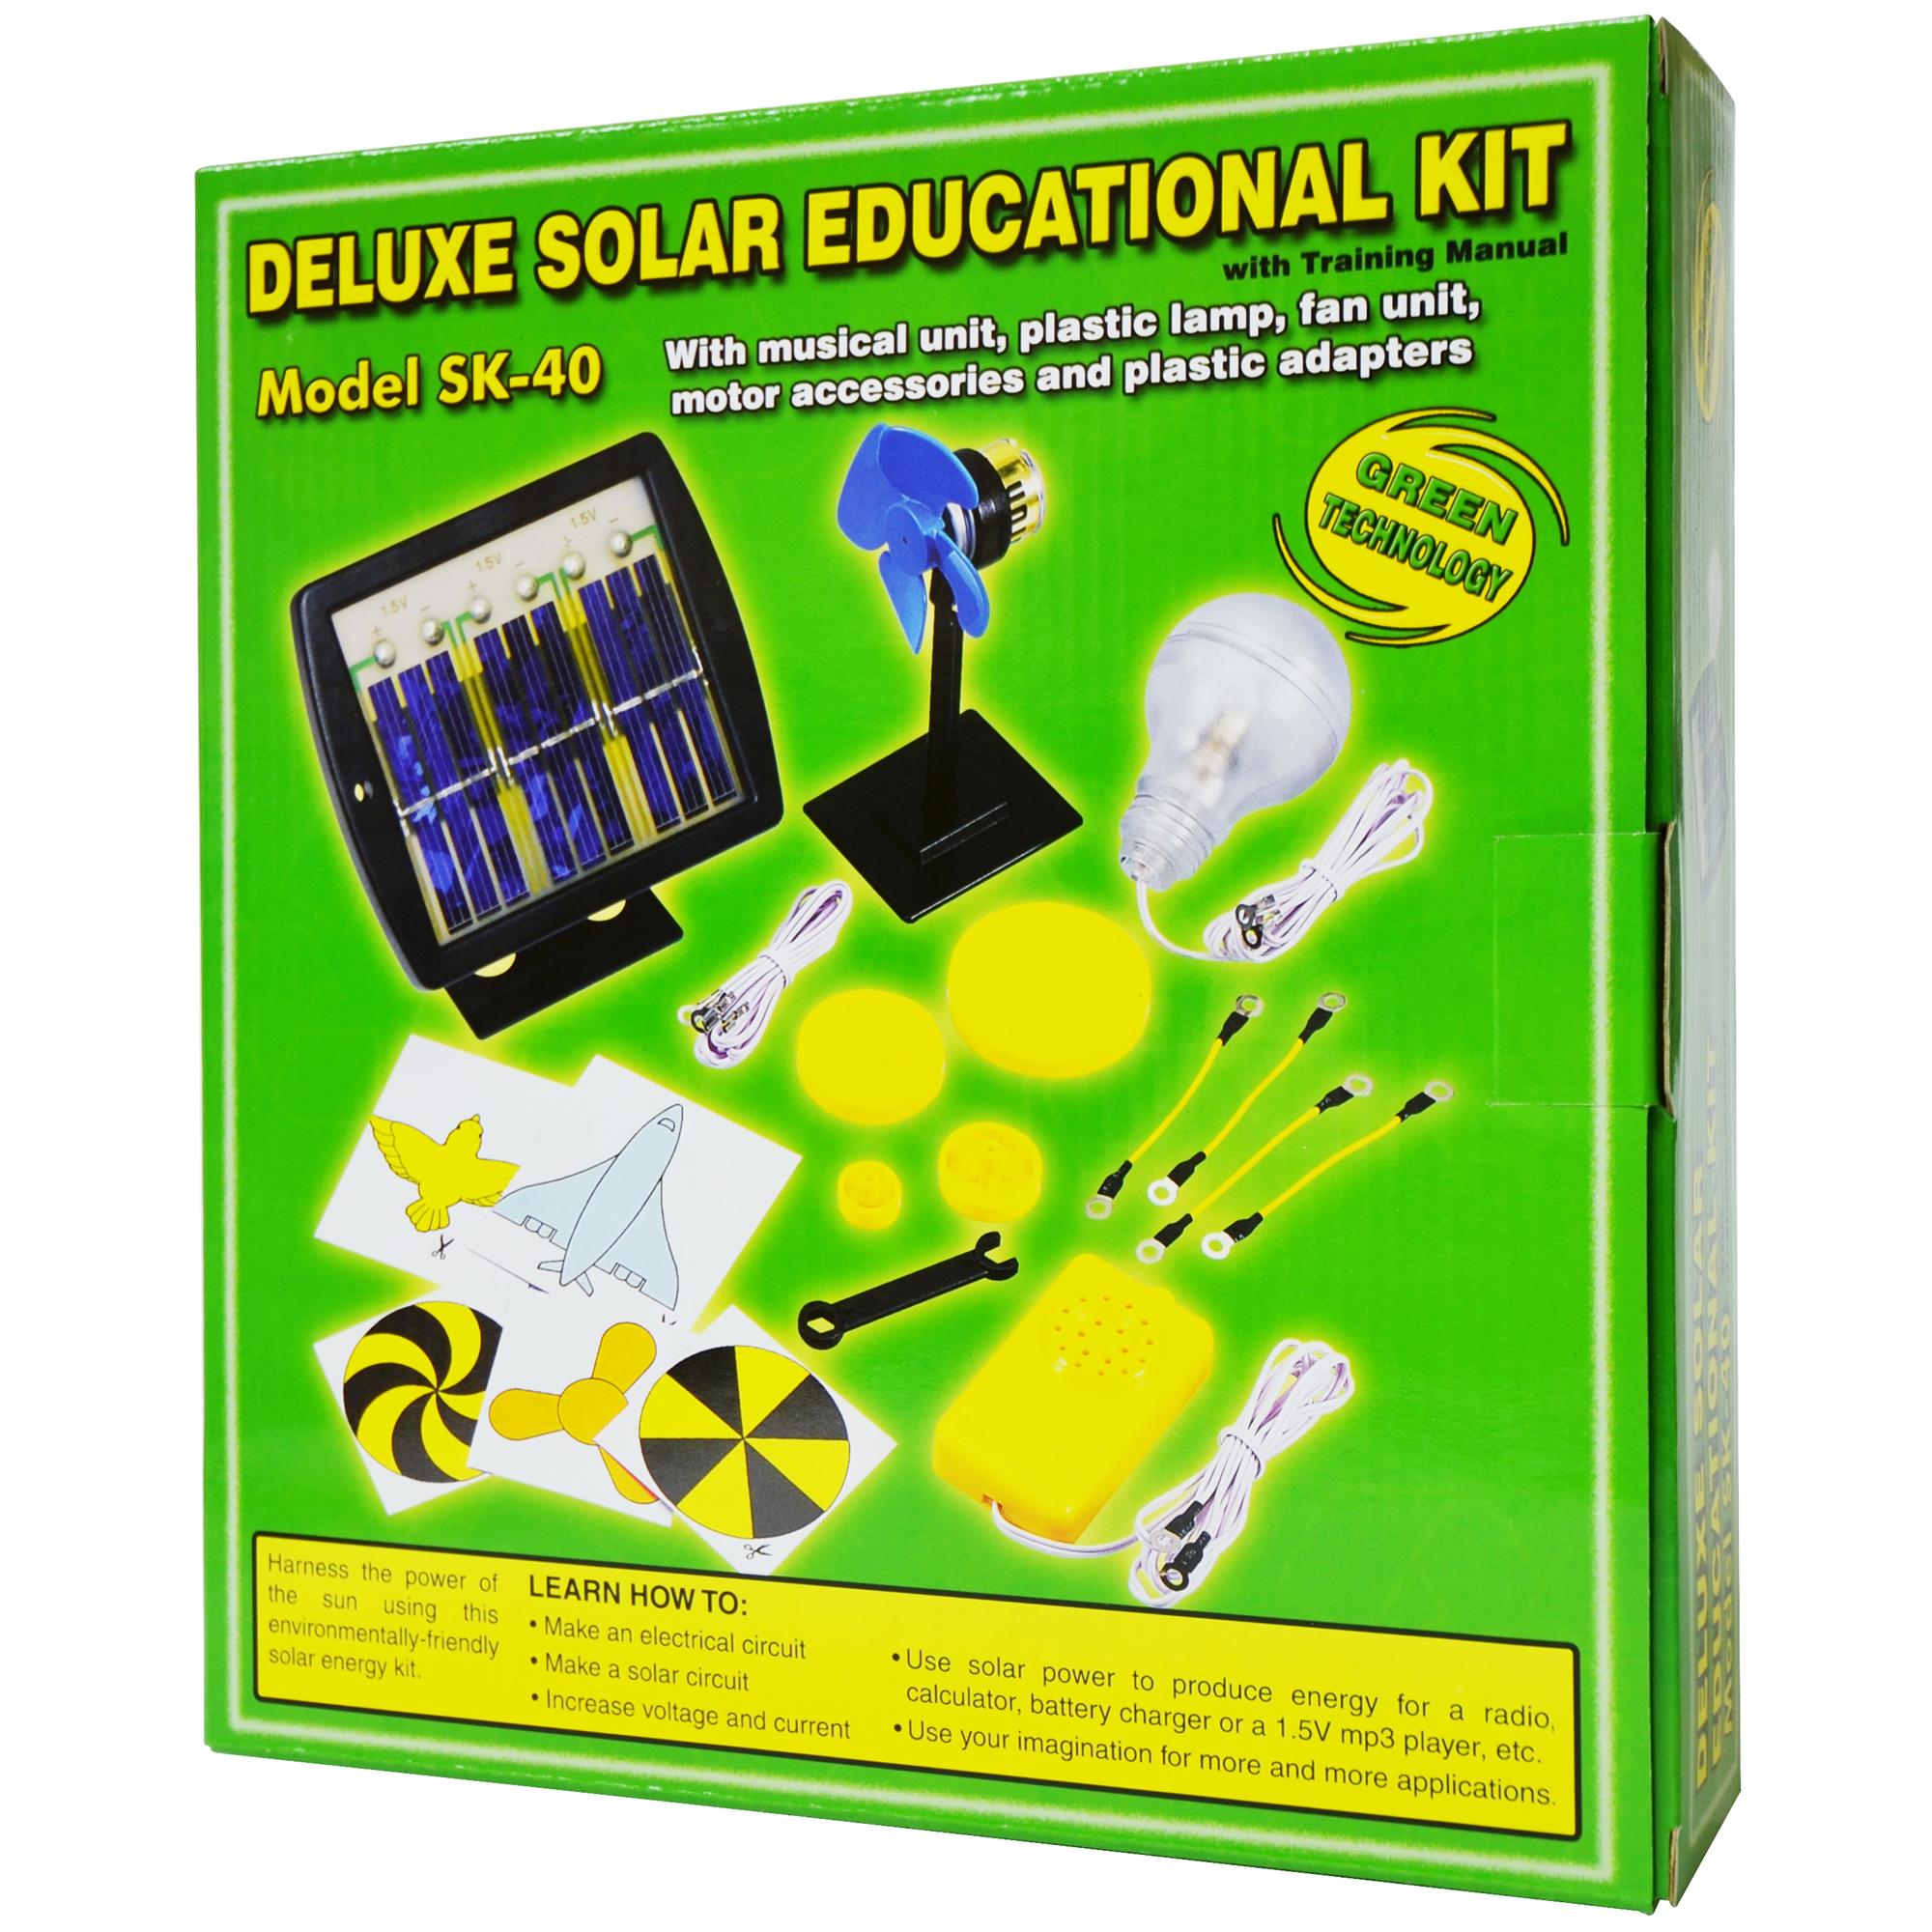 Elenco Solar Deluxe Educational Kit Electronics Inc Sk 40 Snap Circuits Mini Basic Electricity Toys